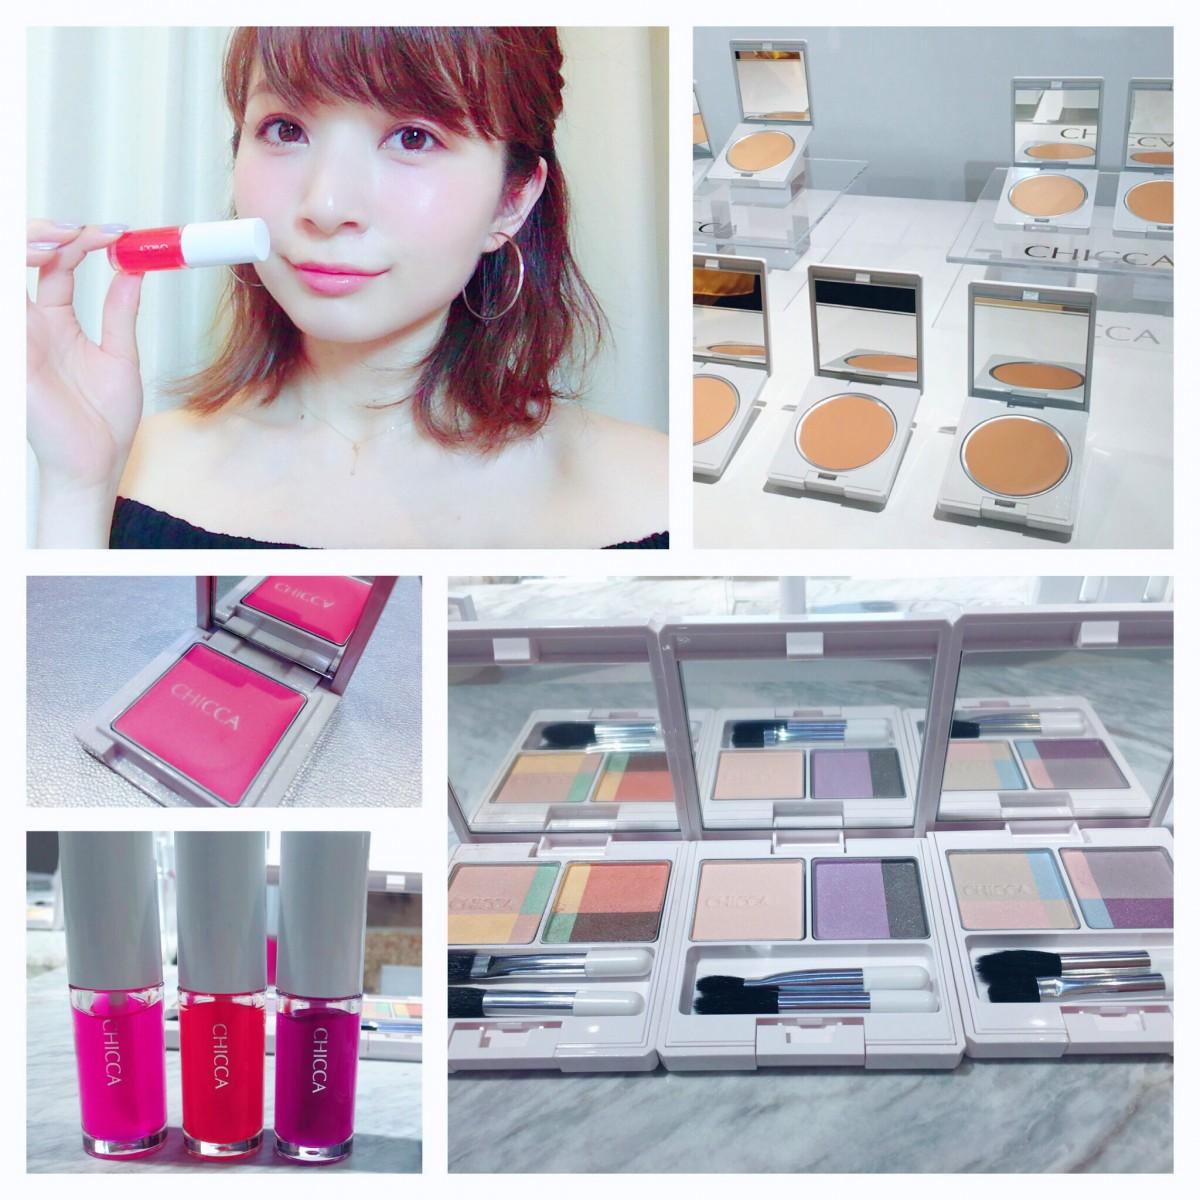 ≪CHICCA 2016 Autumn  Makeup Collection≫軽やかな艶と質感にメロメロ♡新作発表会へ行ってきました!